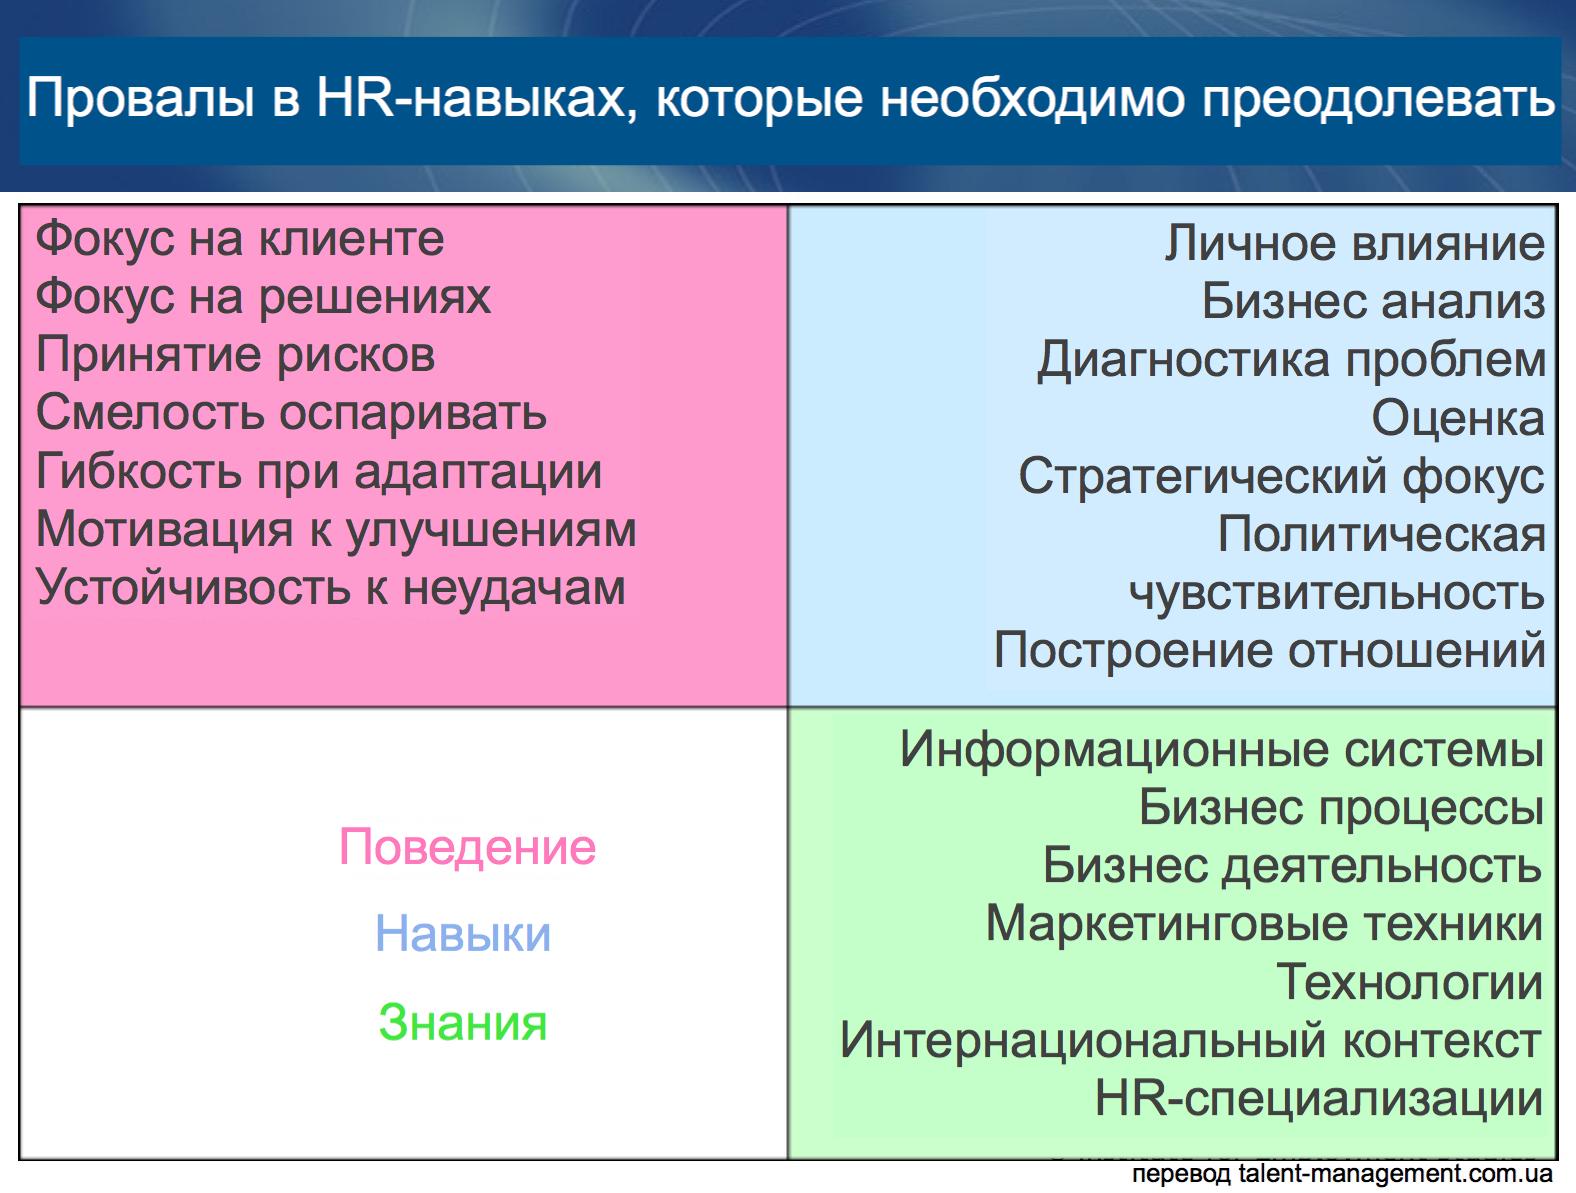 HR-навыки